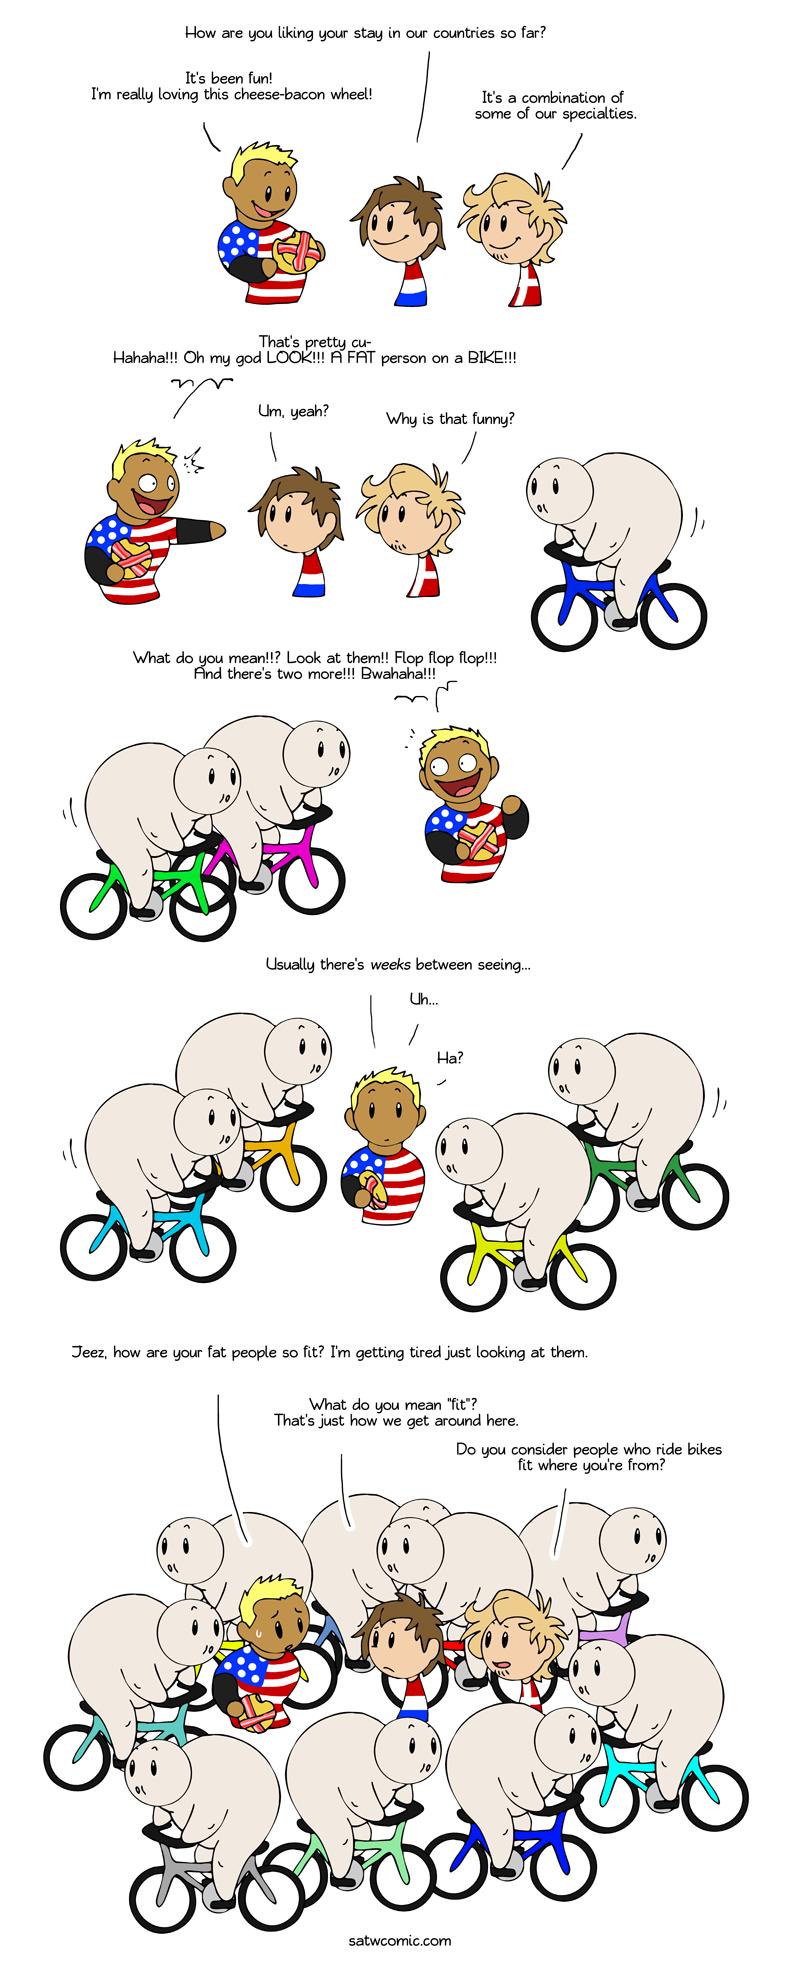 Bike it off satwcomic.com